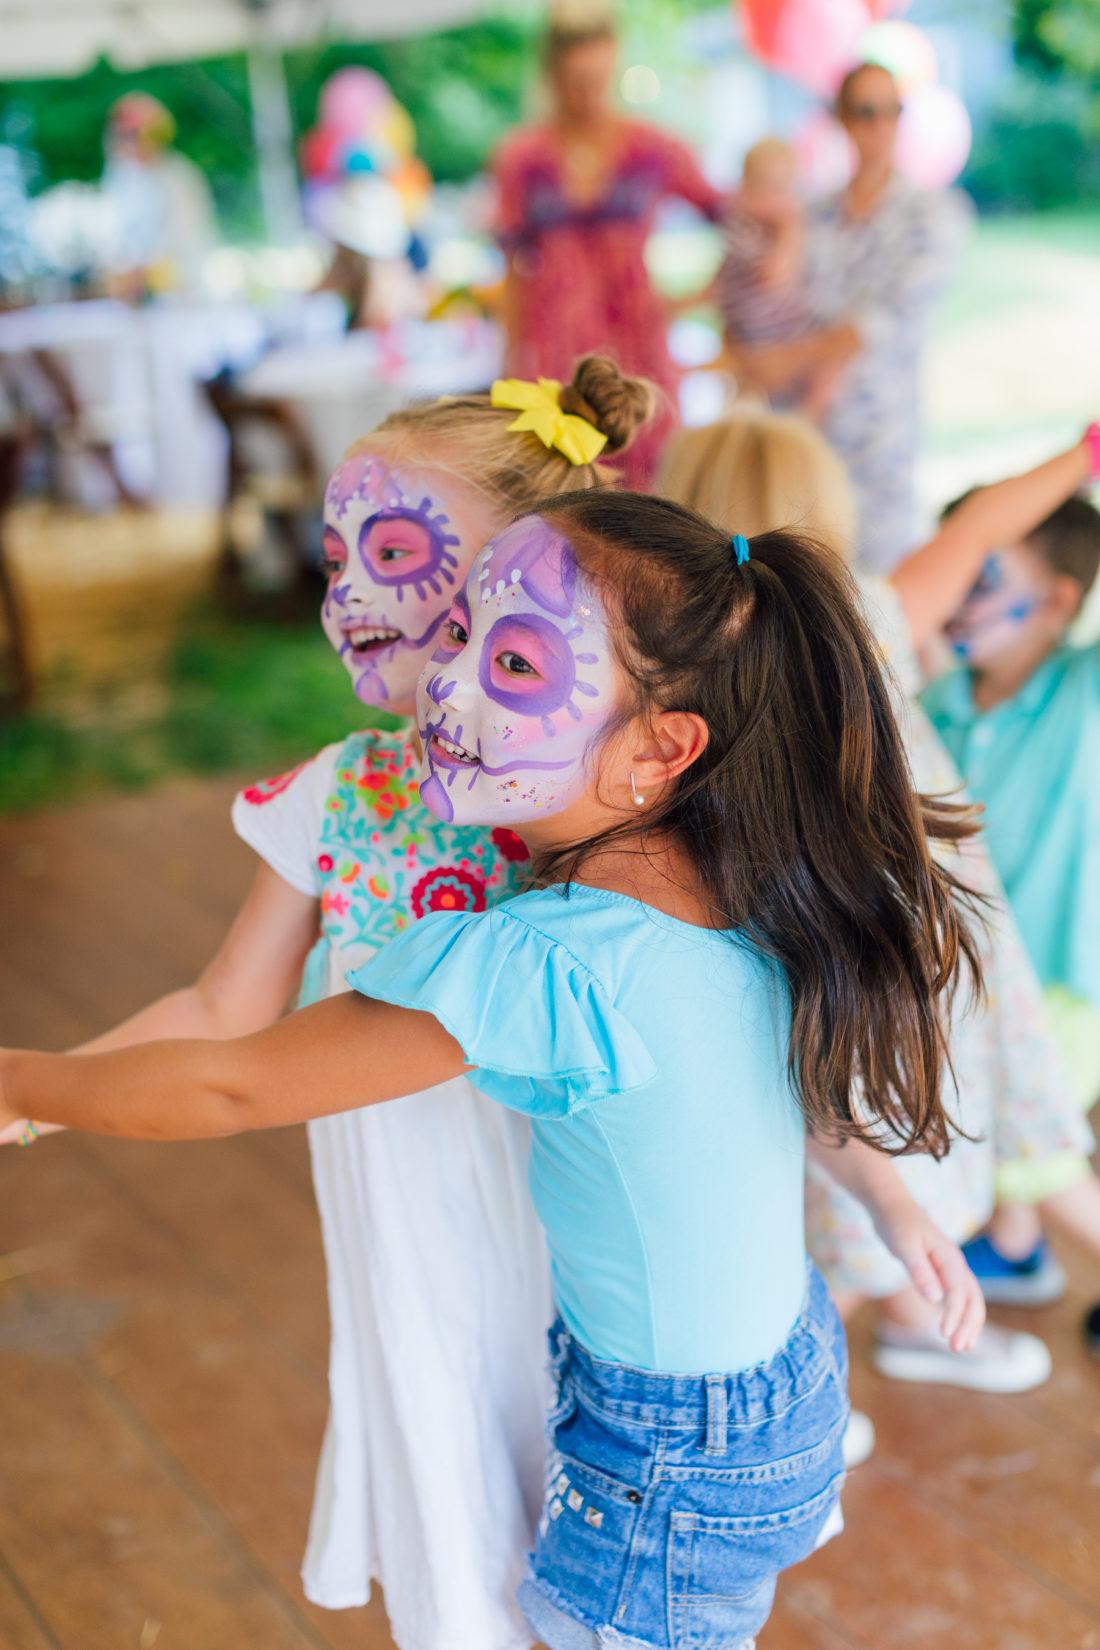 Marlowe Martino dances with a friend at her Cinco de Marlowe themed 5th birthday fiesta